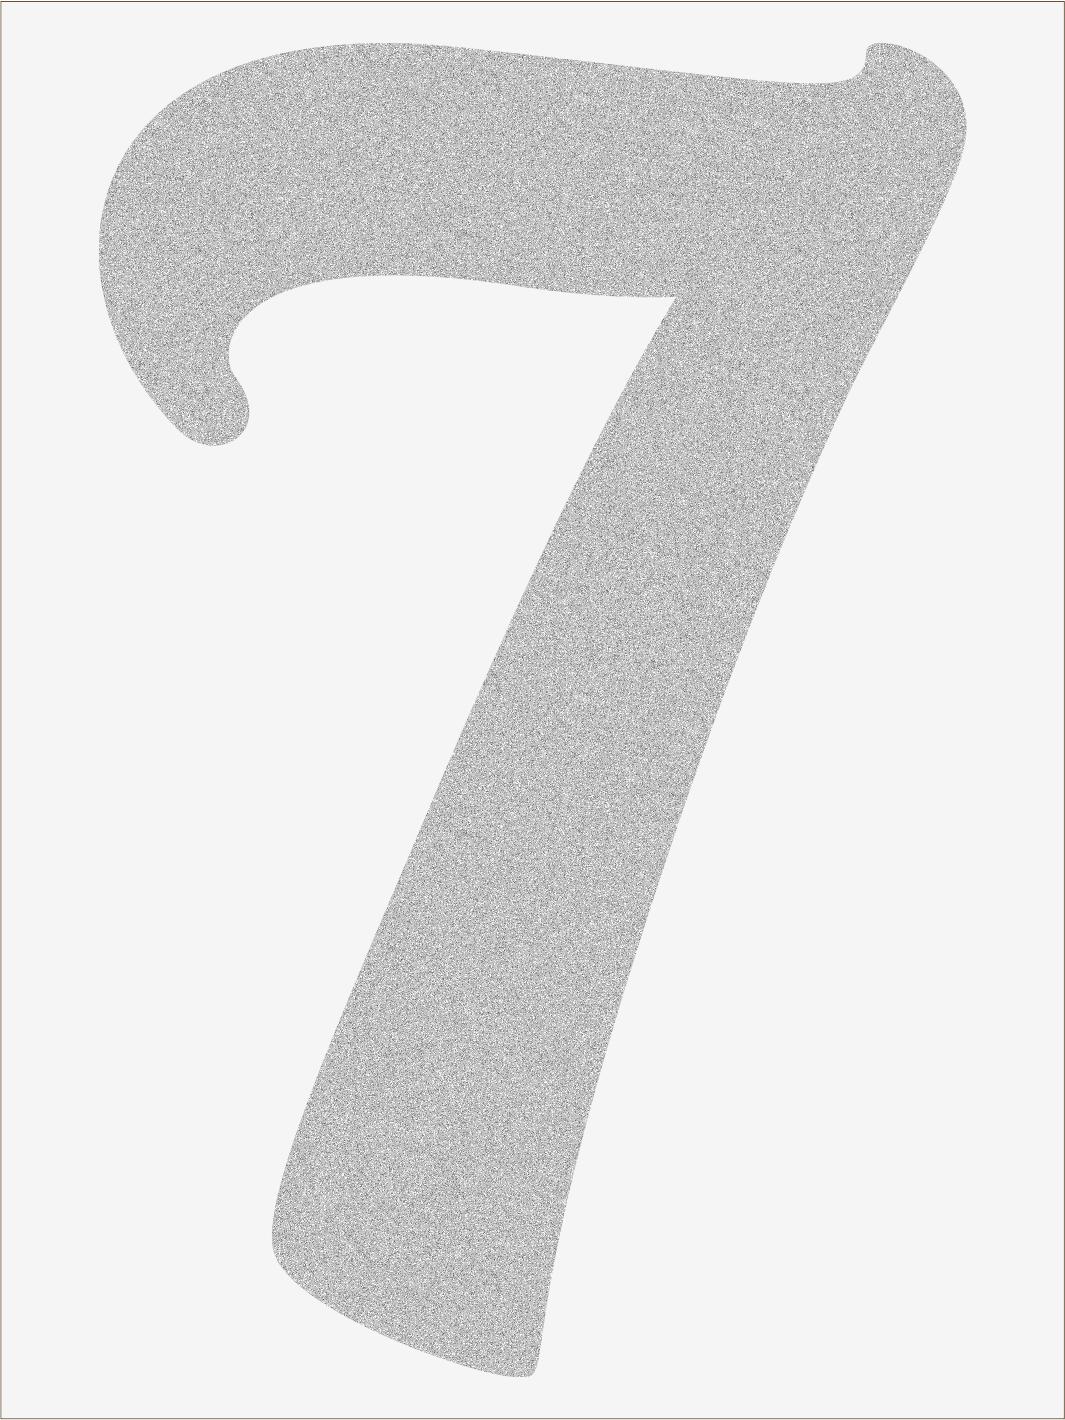 Číslica 7 font1